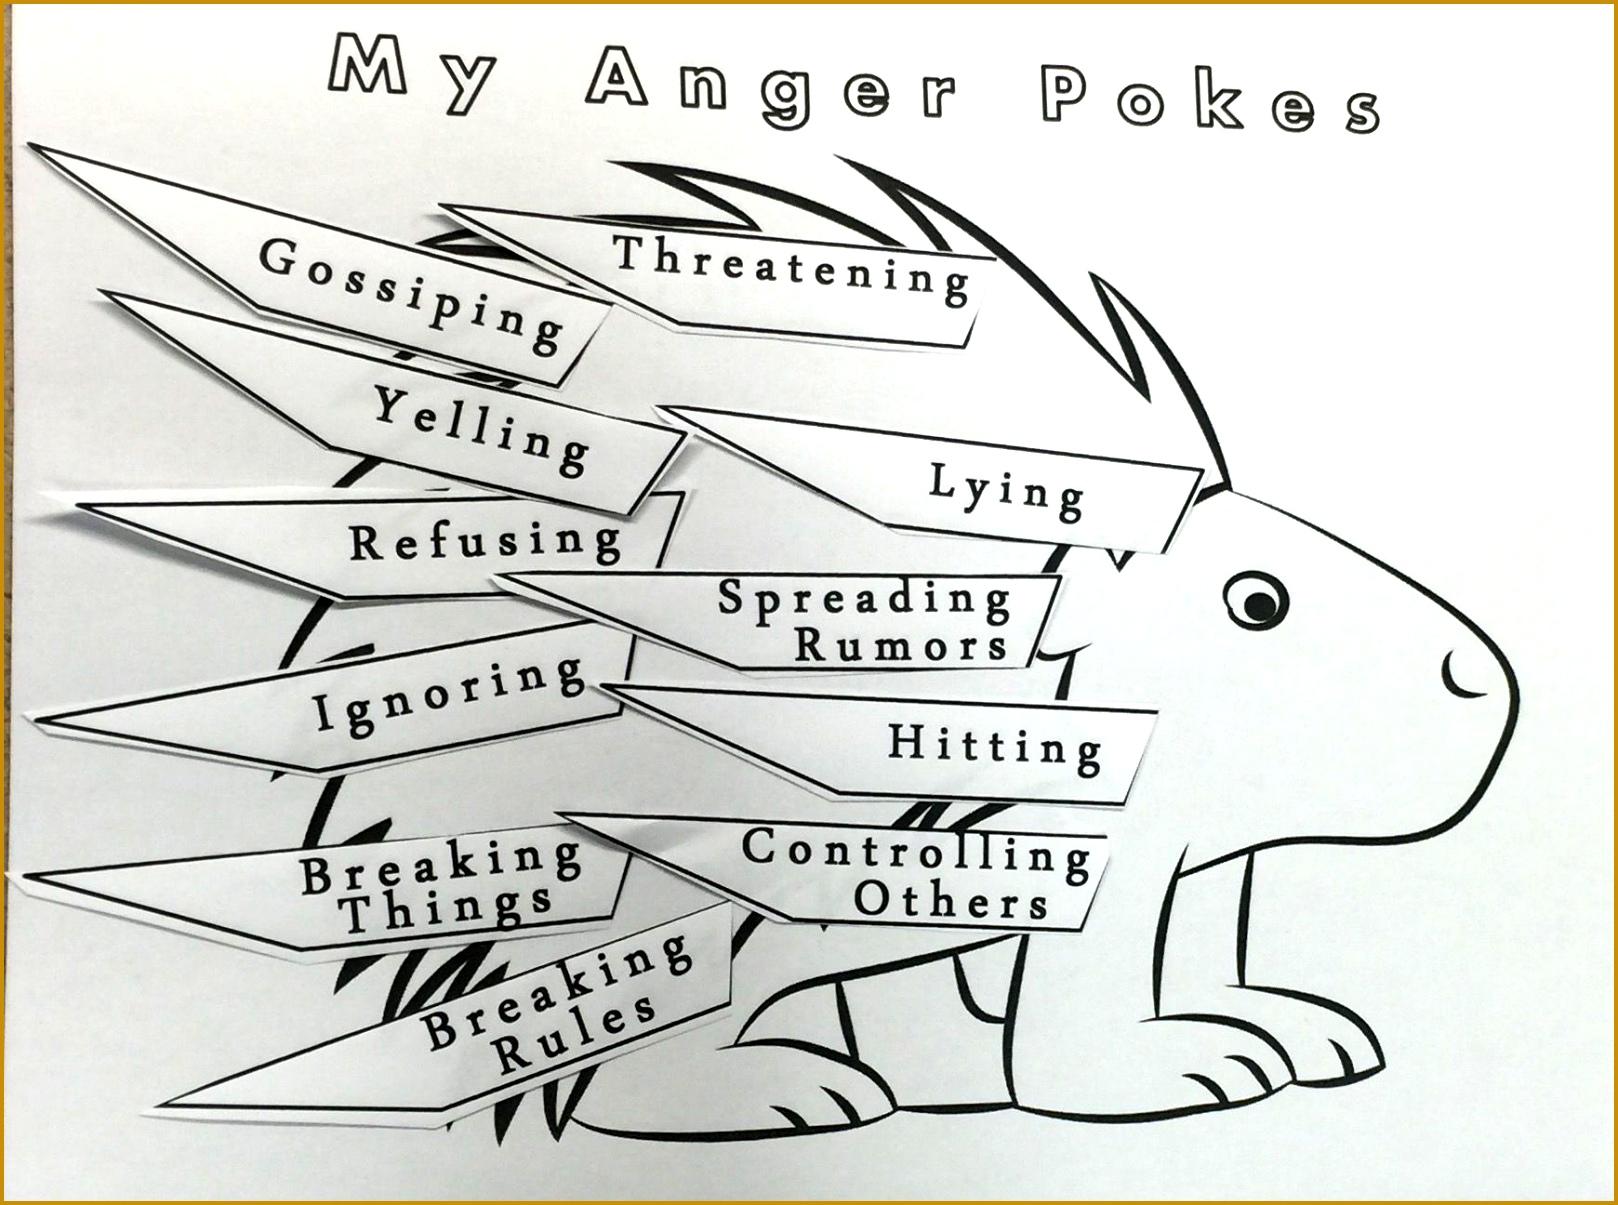 Worksheets Therapeutic Worksheets For Children cbt worksheets for children 71536 how to prevent bullying worksheet 79187 anger porcupine pokes flip book art craft